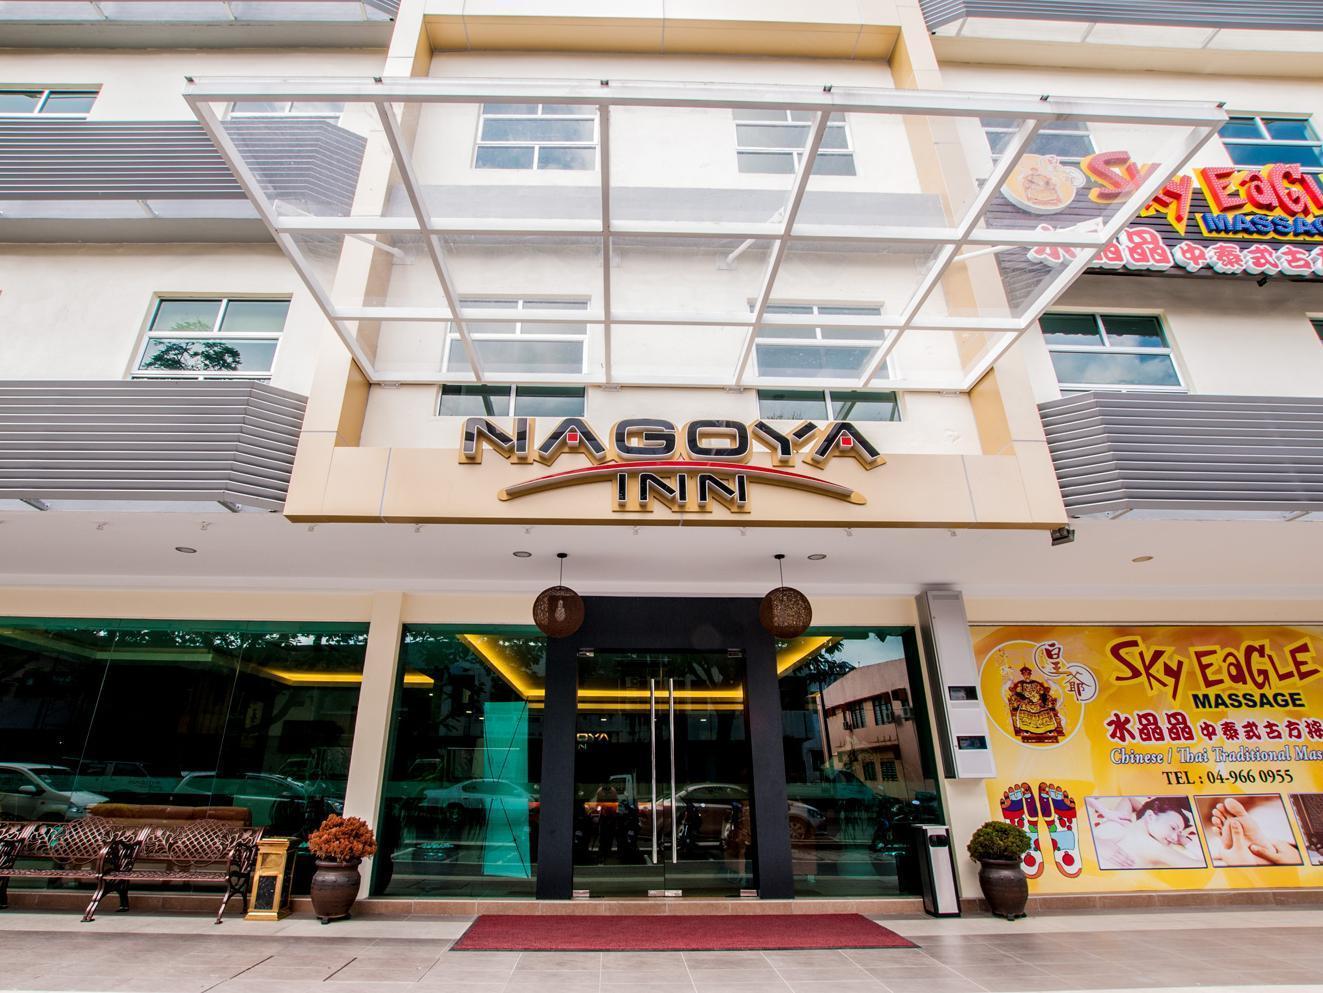 Nagoya Inn